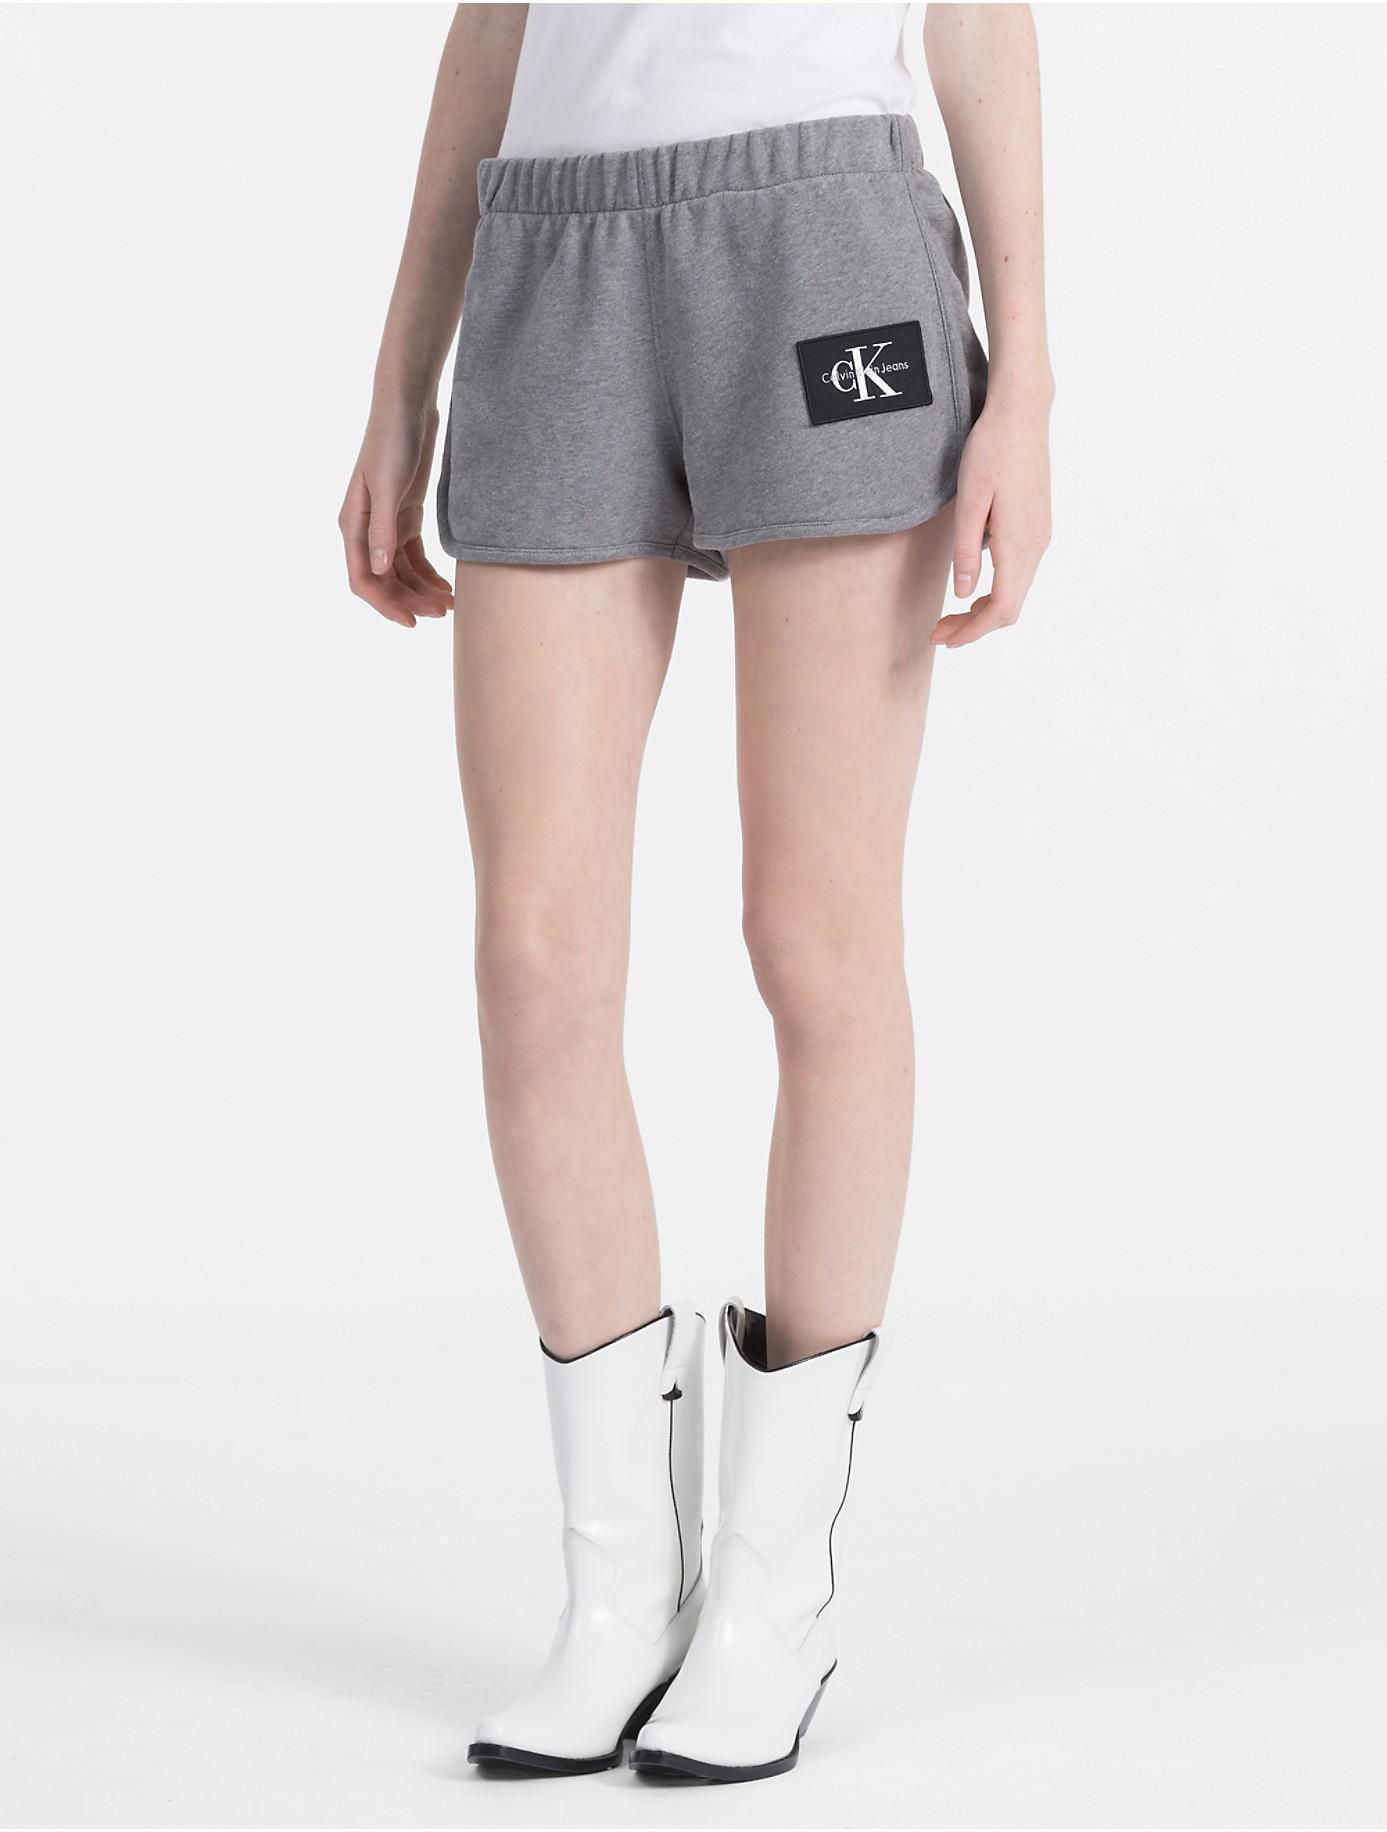 Sale Sast Calvin Klein LOGO BAND COTTON SWEAT SHORTS Popular Cheap Excellent Online pougU